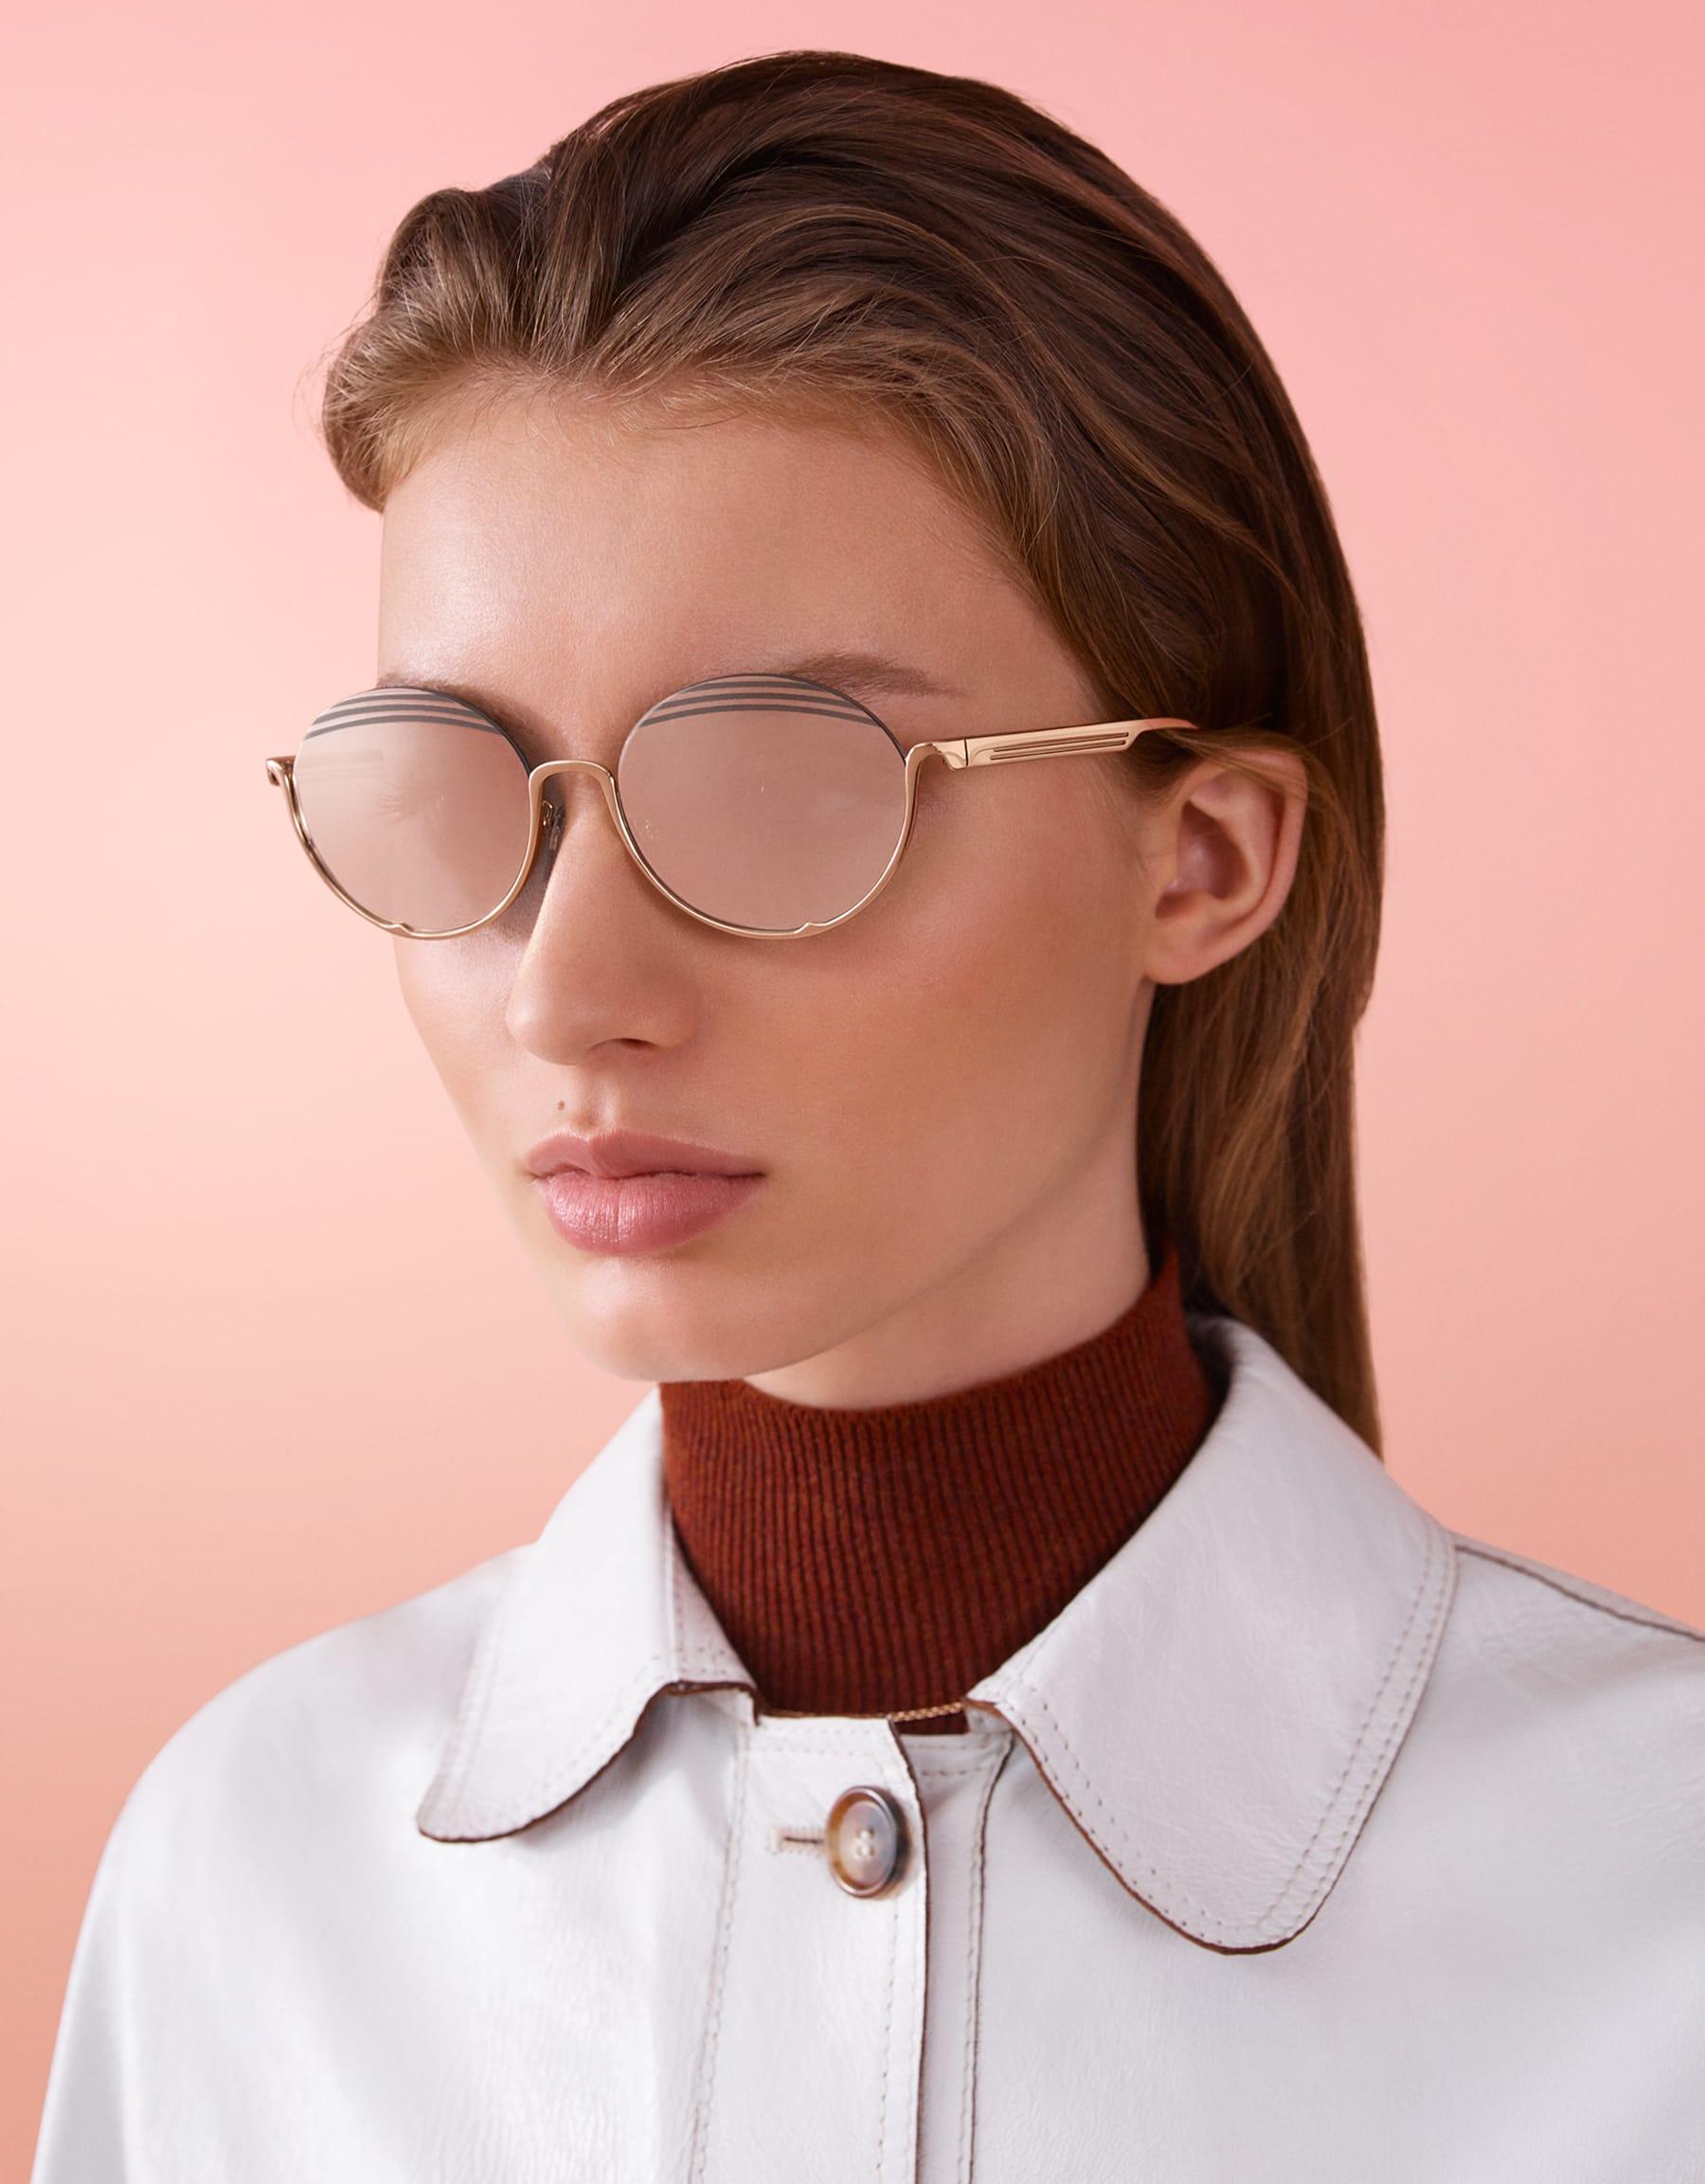 Bvlgari B.zero1 B.stripe semi-rimless oval metal sunglasses. 903713 image 3